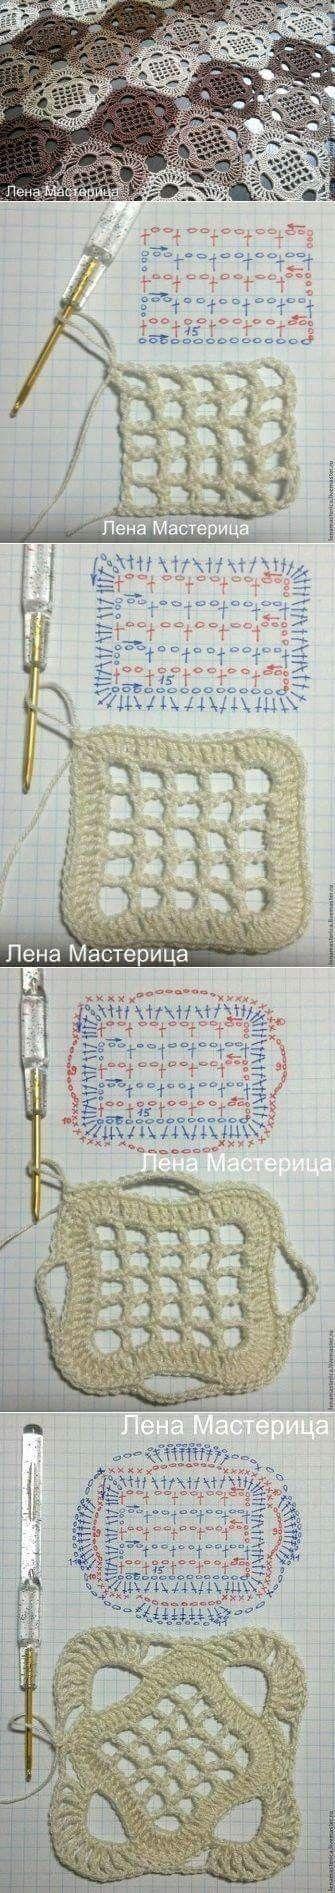 Para tapete | Patrones crochet gratis | Pinterest | Tapetes ...